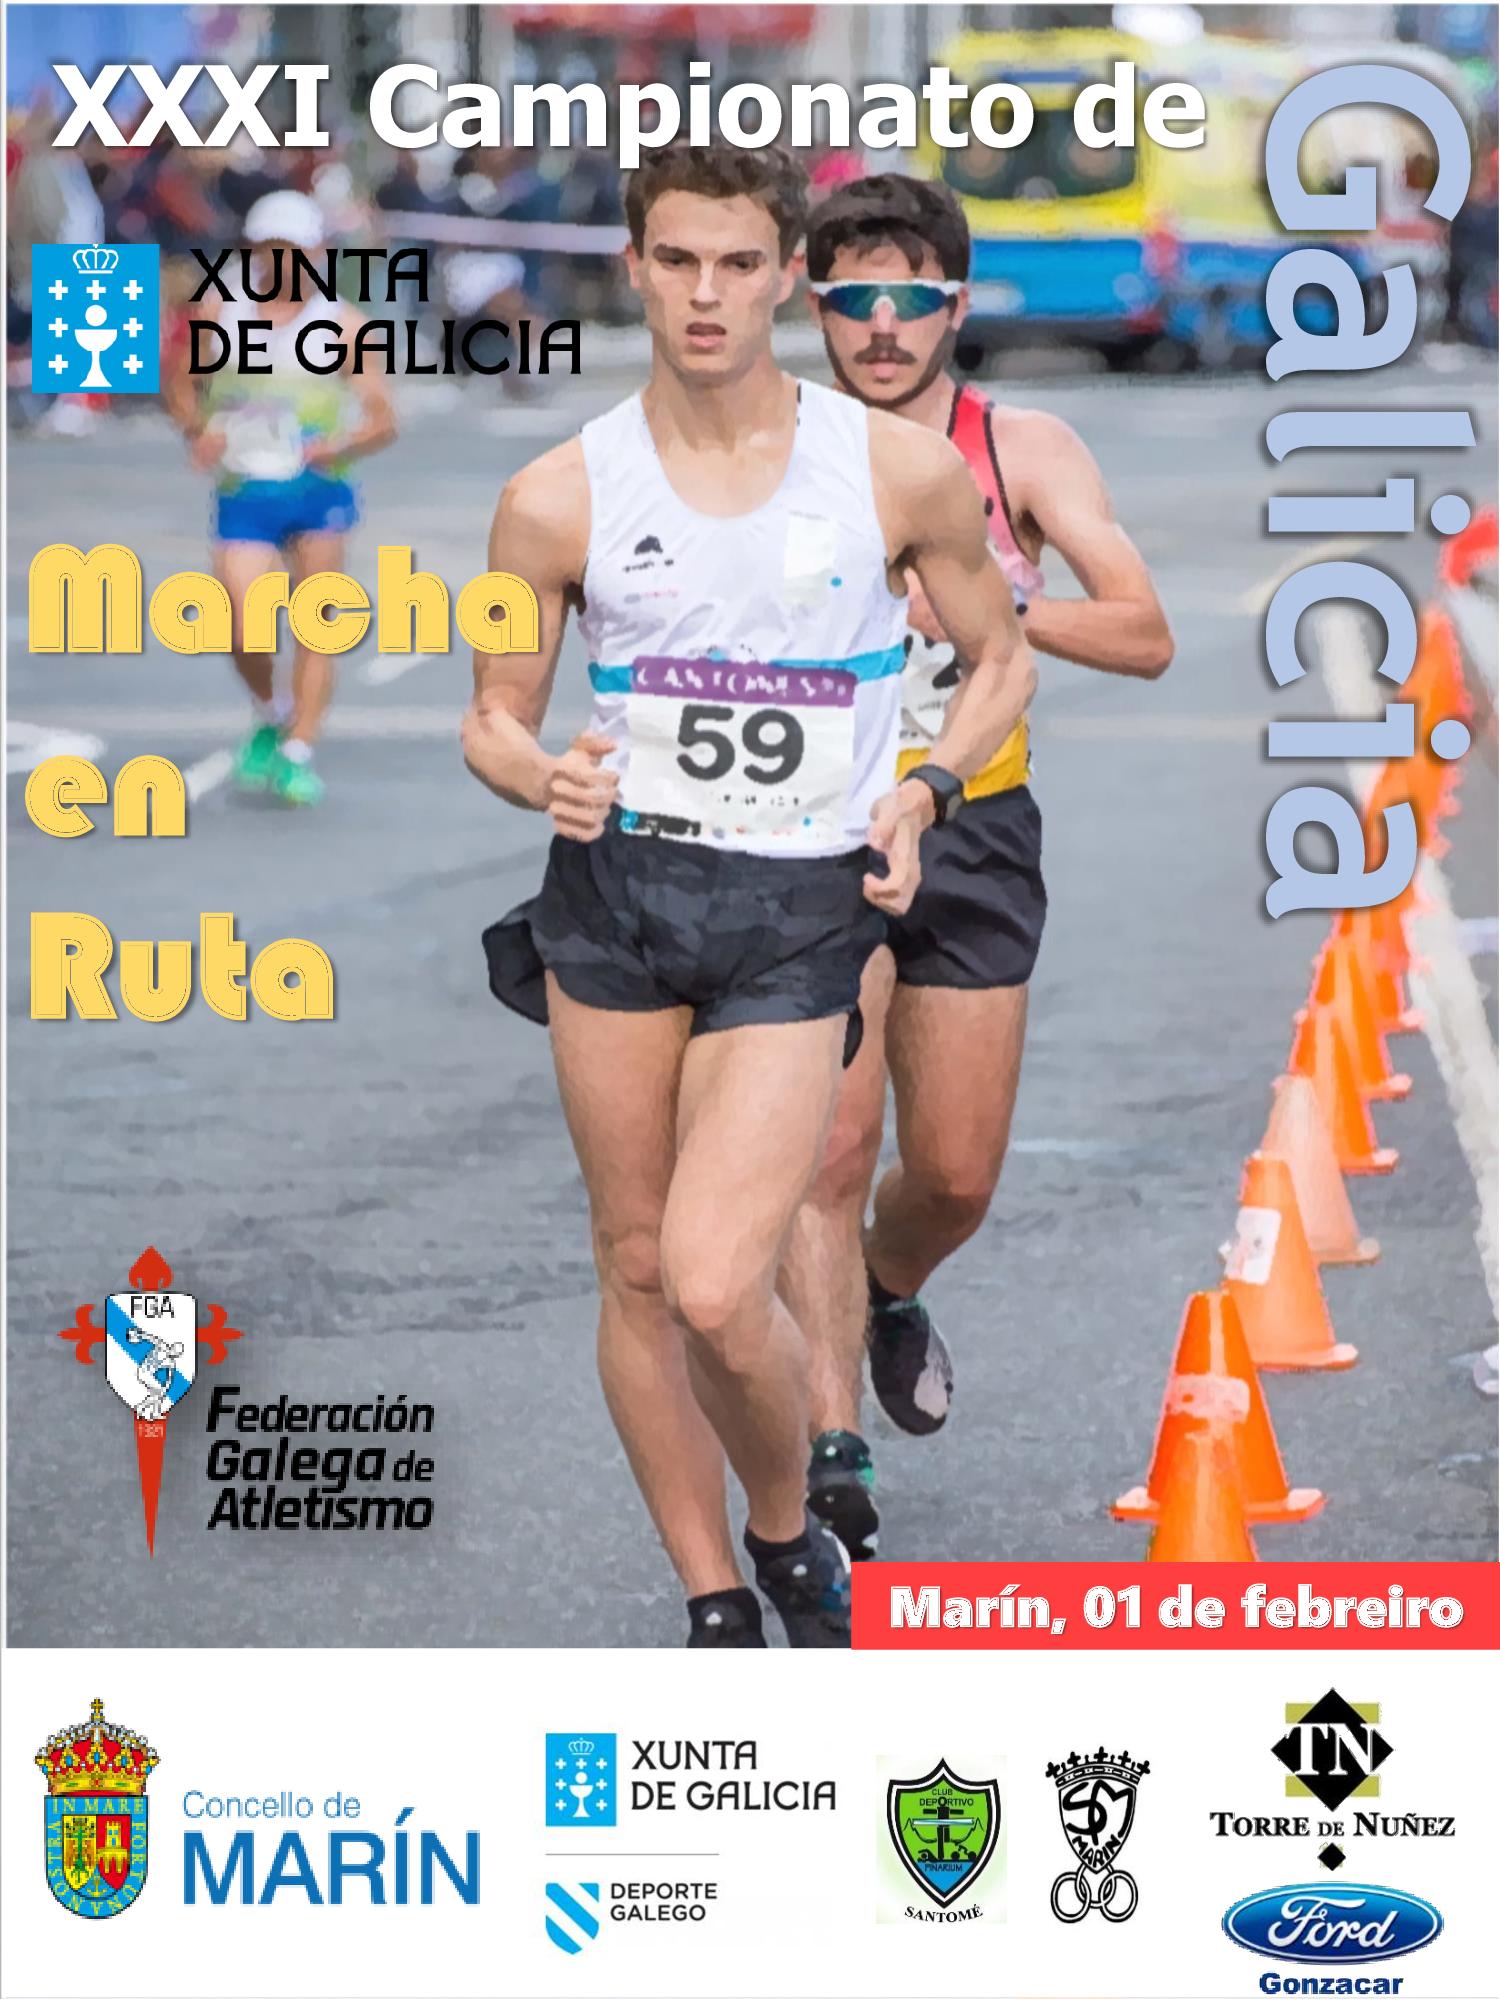 XXXI Campionato de Galicia de Marcha en Ruta